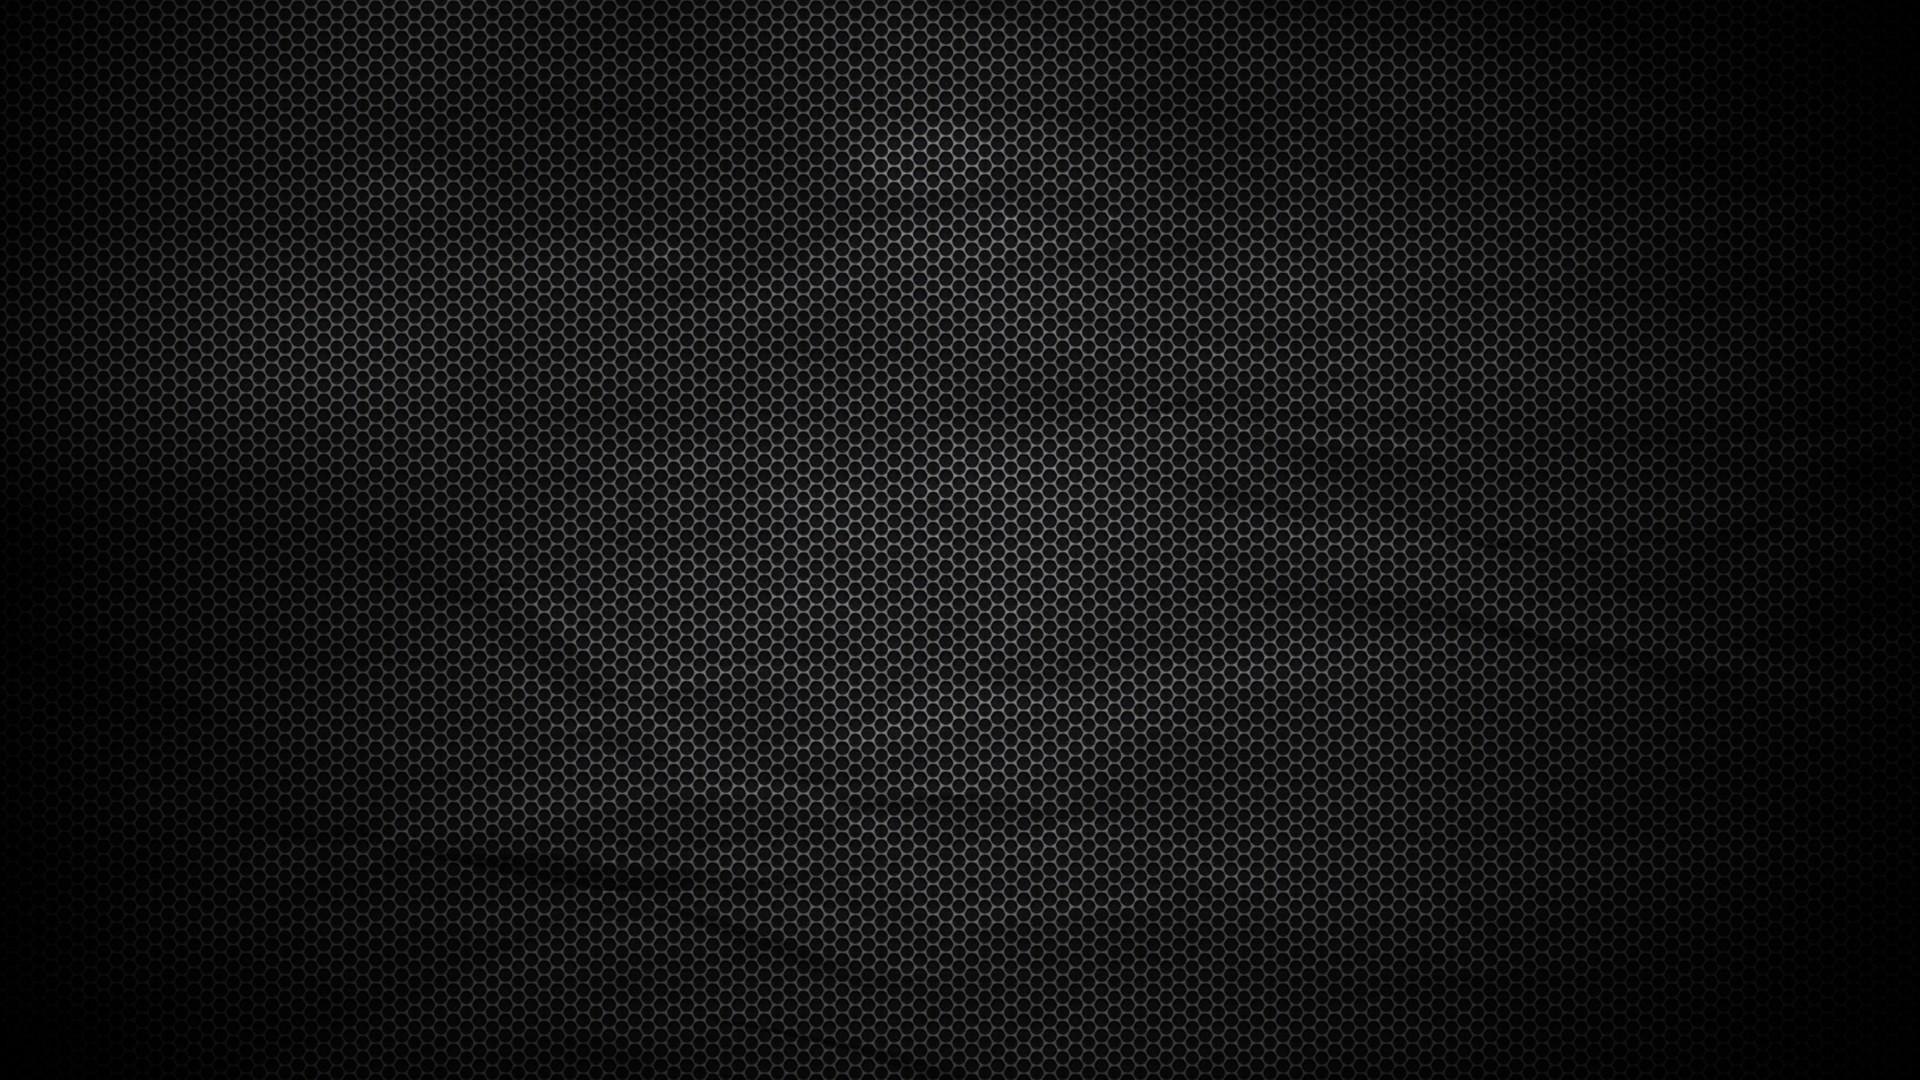 Black Full HD Wallpaper